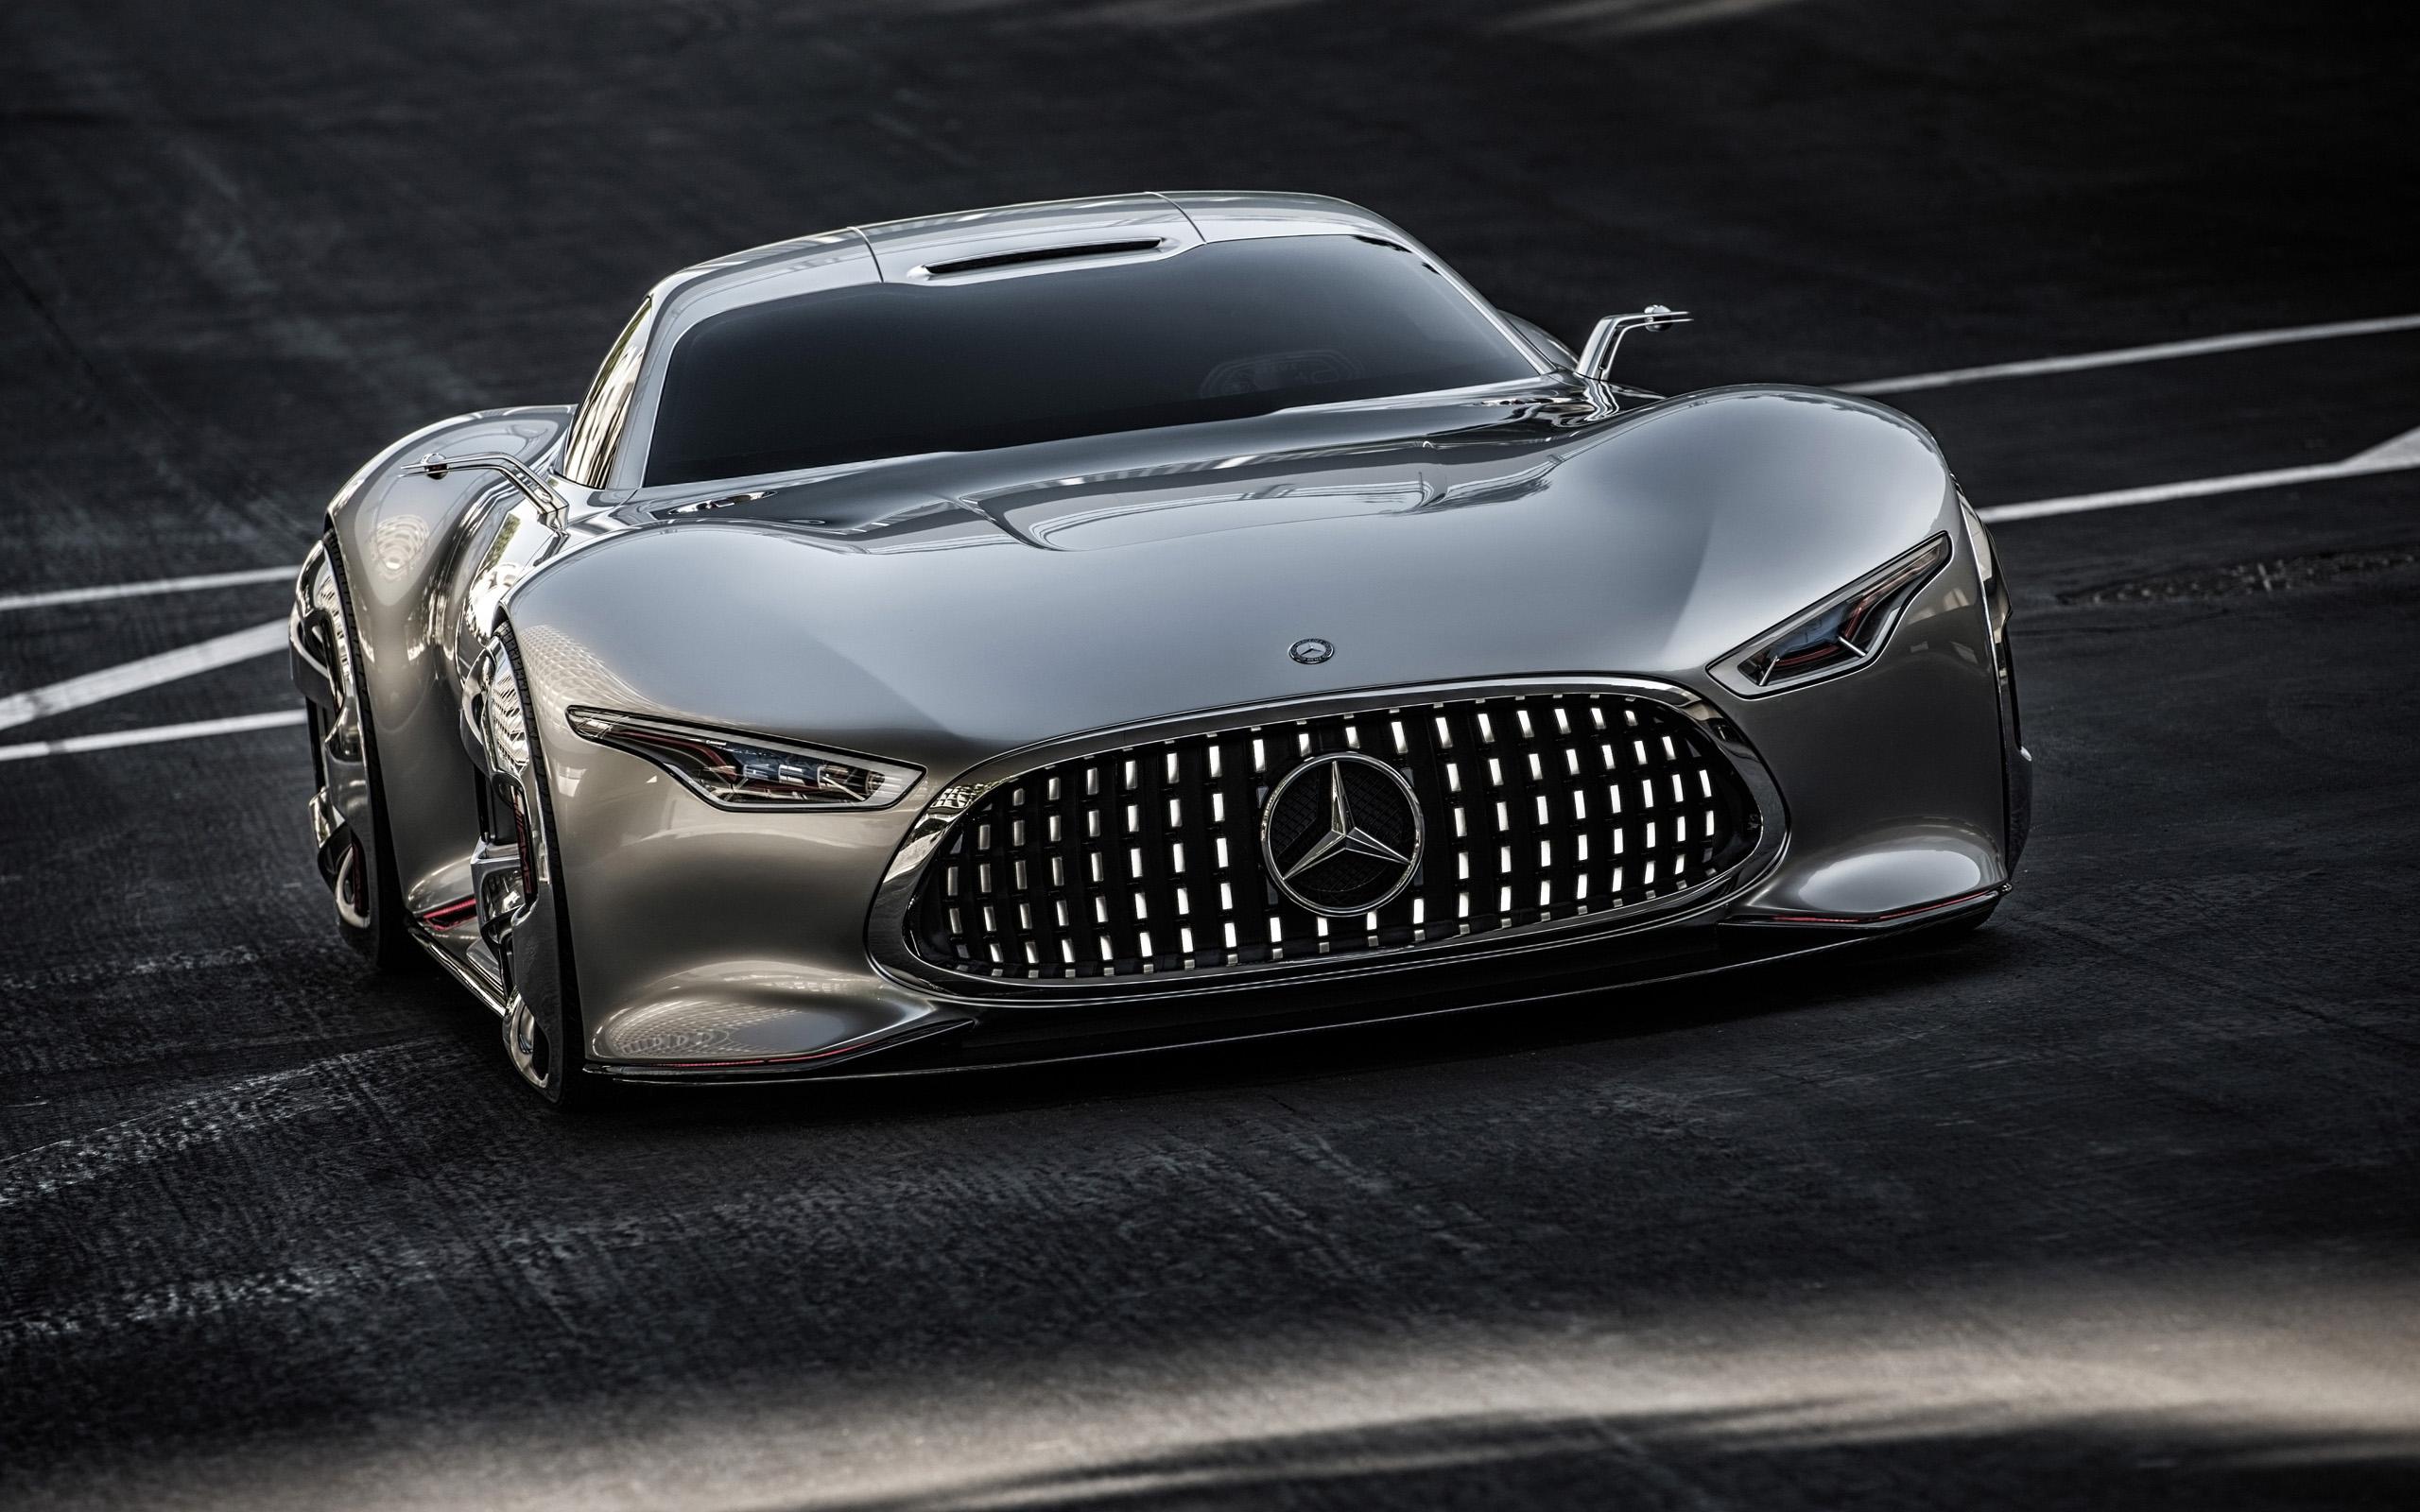 2013 Mercedes Benz AMG Vision Gran Turismo